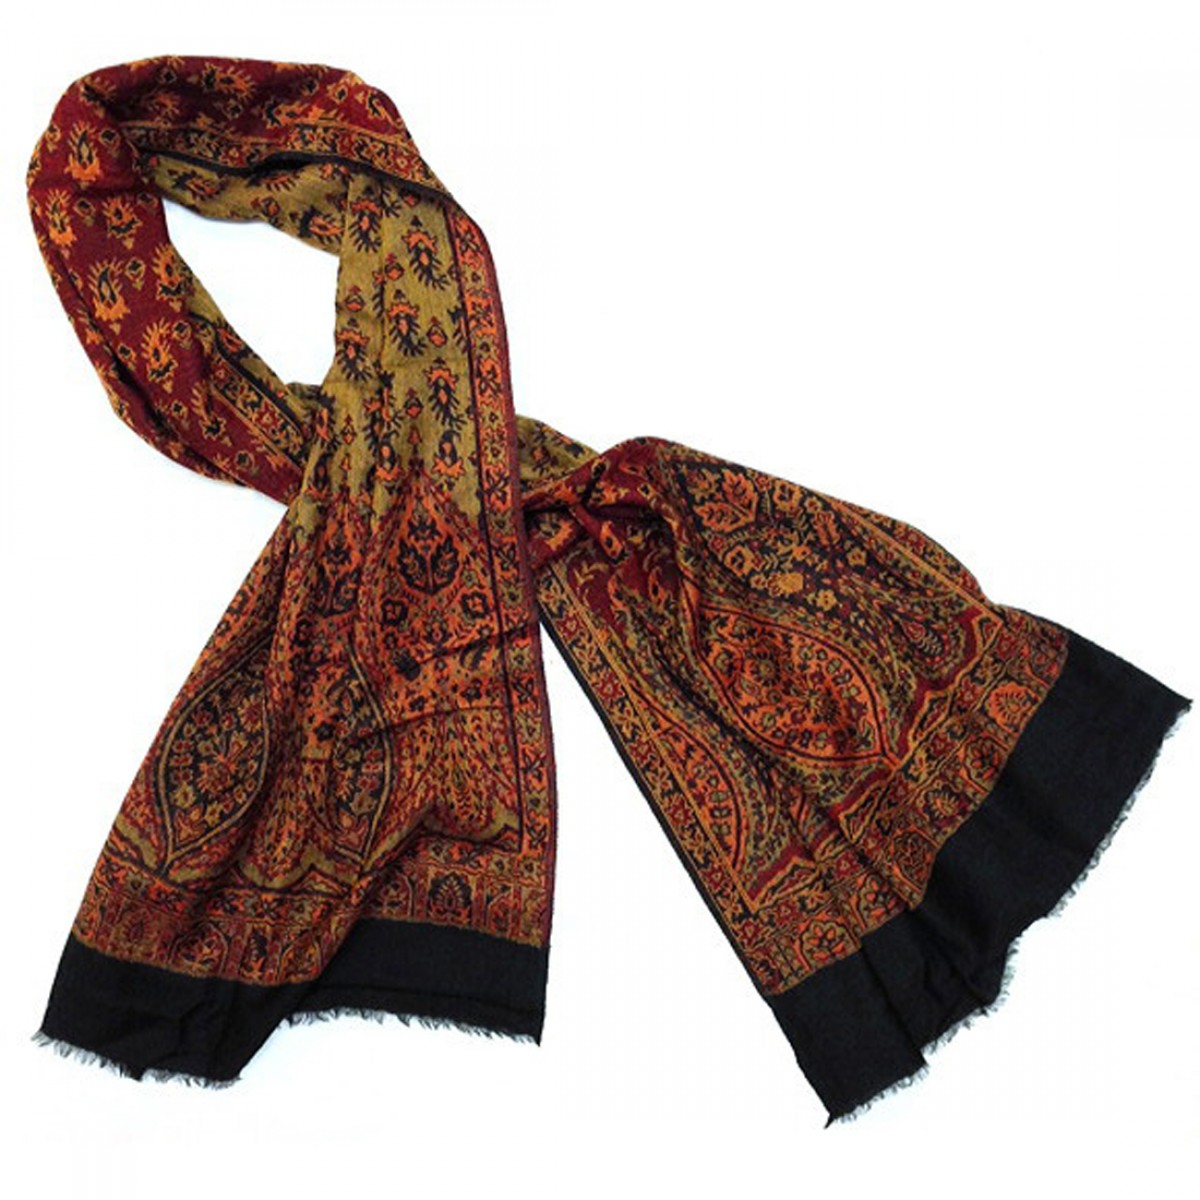 Reversible Woven Wool / Cotton Blend Shawl